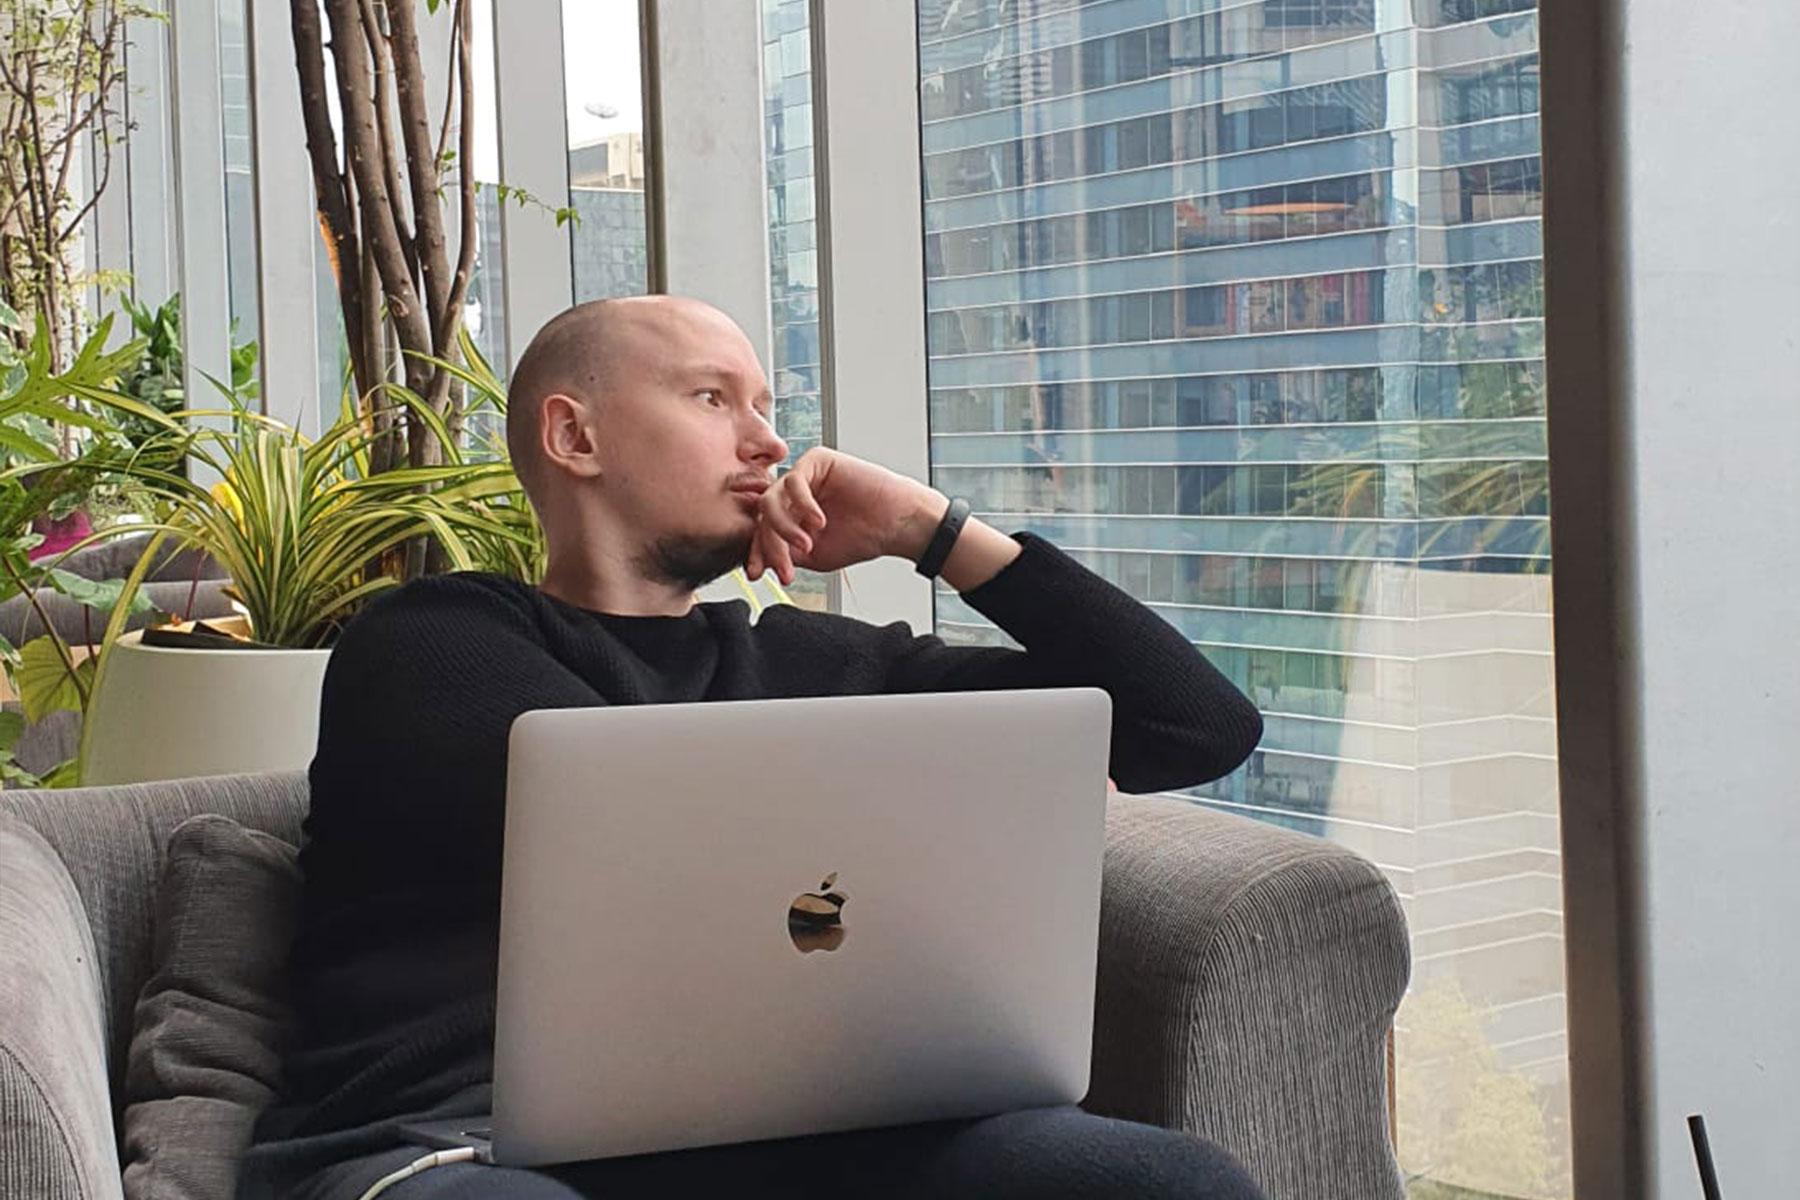 Simon schaut aus dem Fenster mit dem Mac Book auf dem Schoss